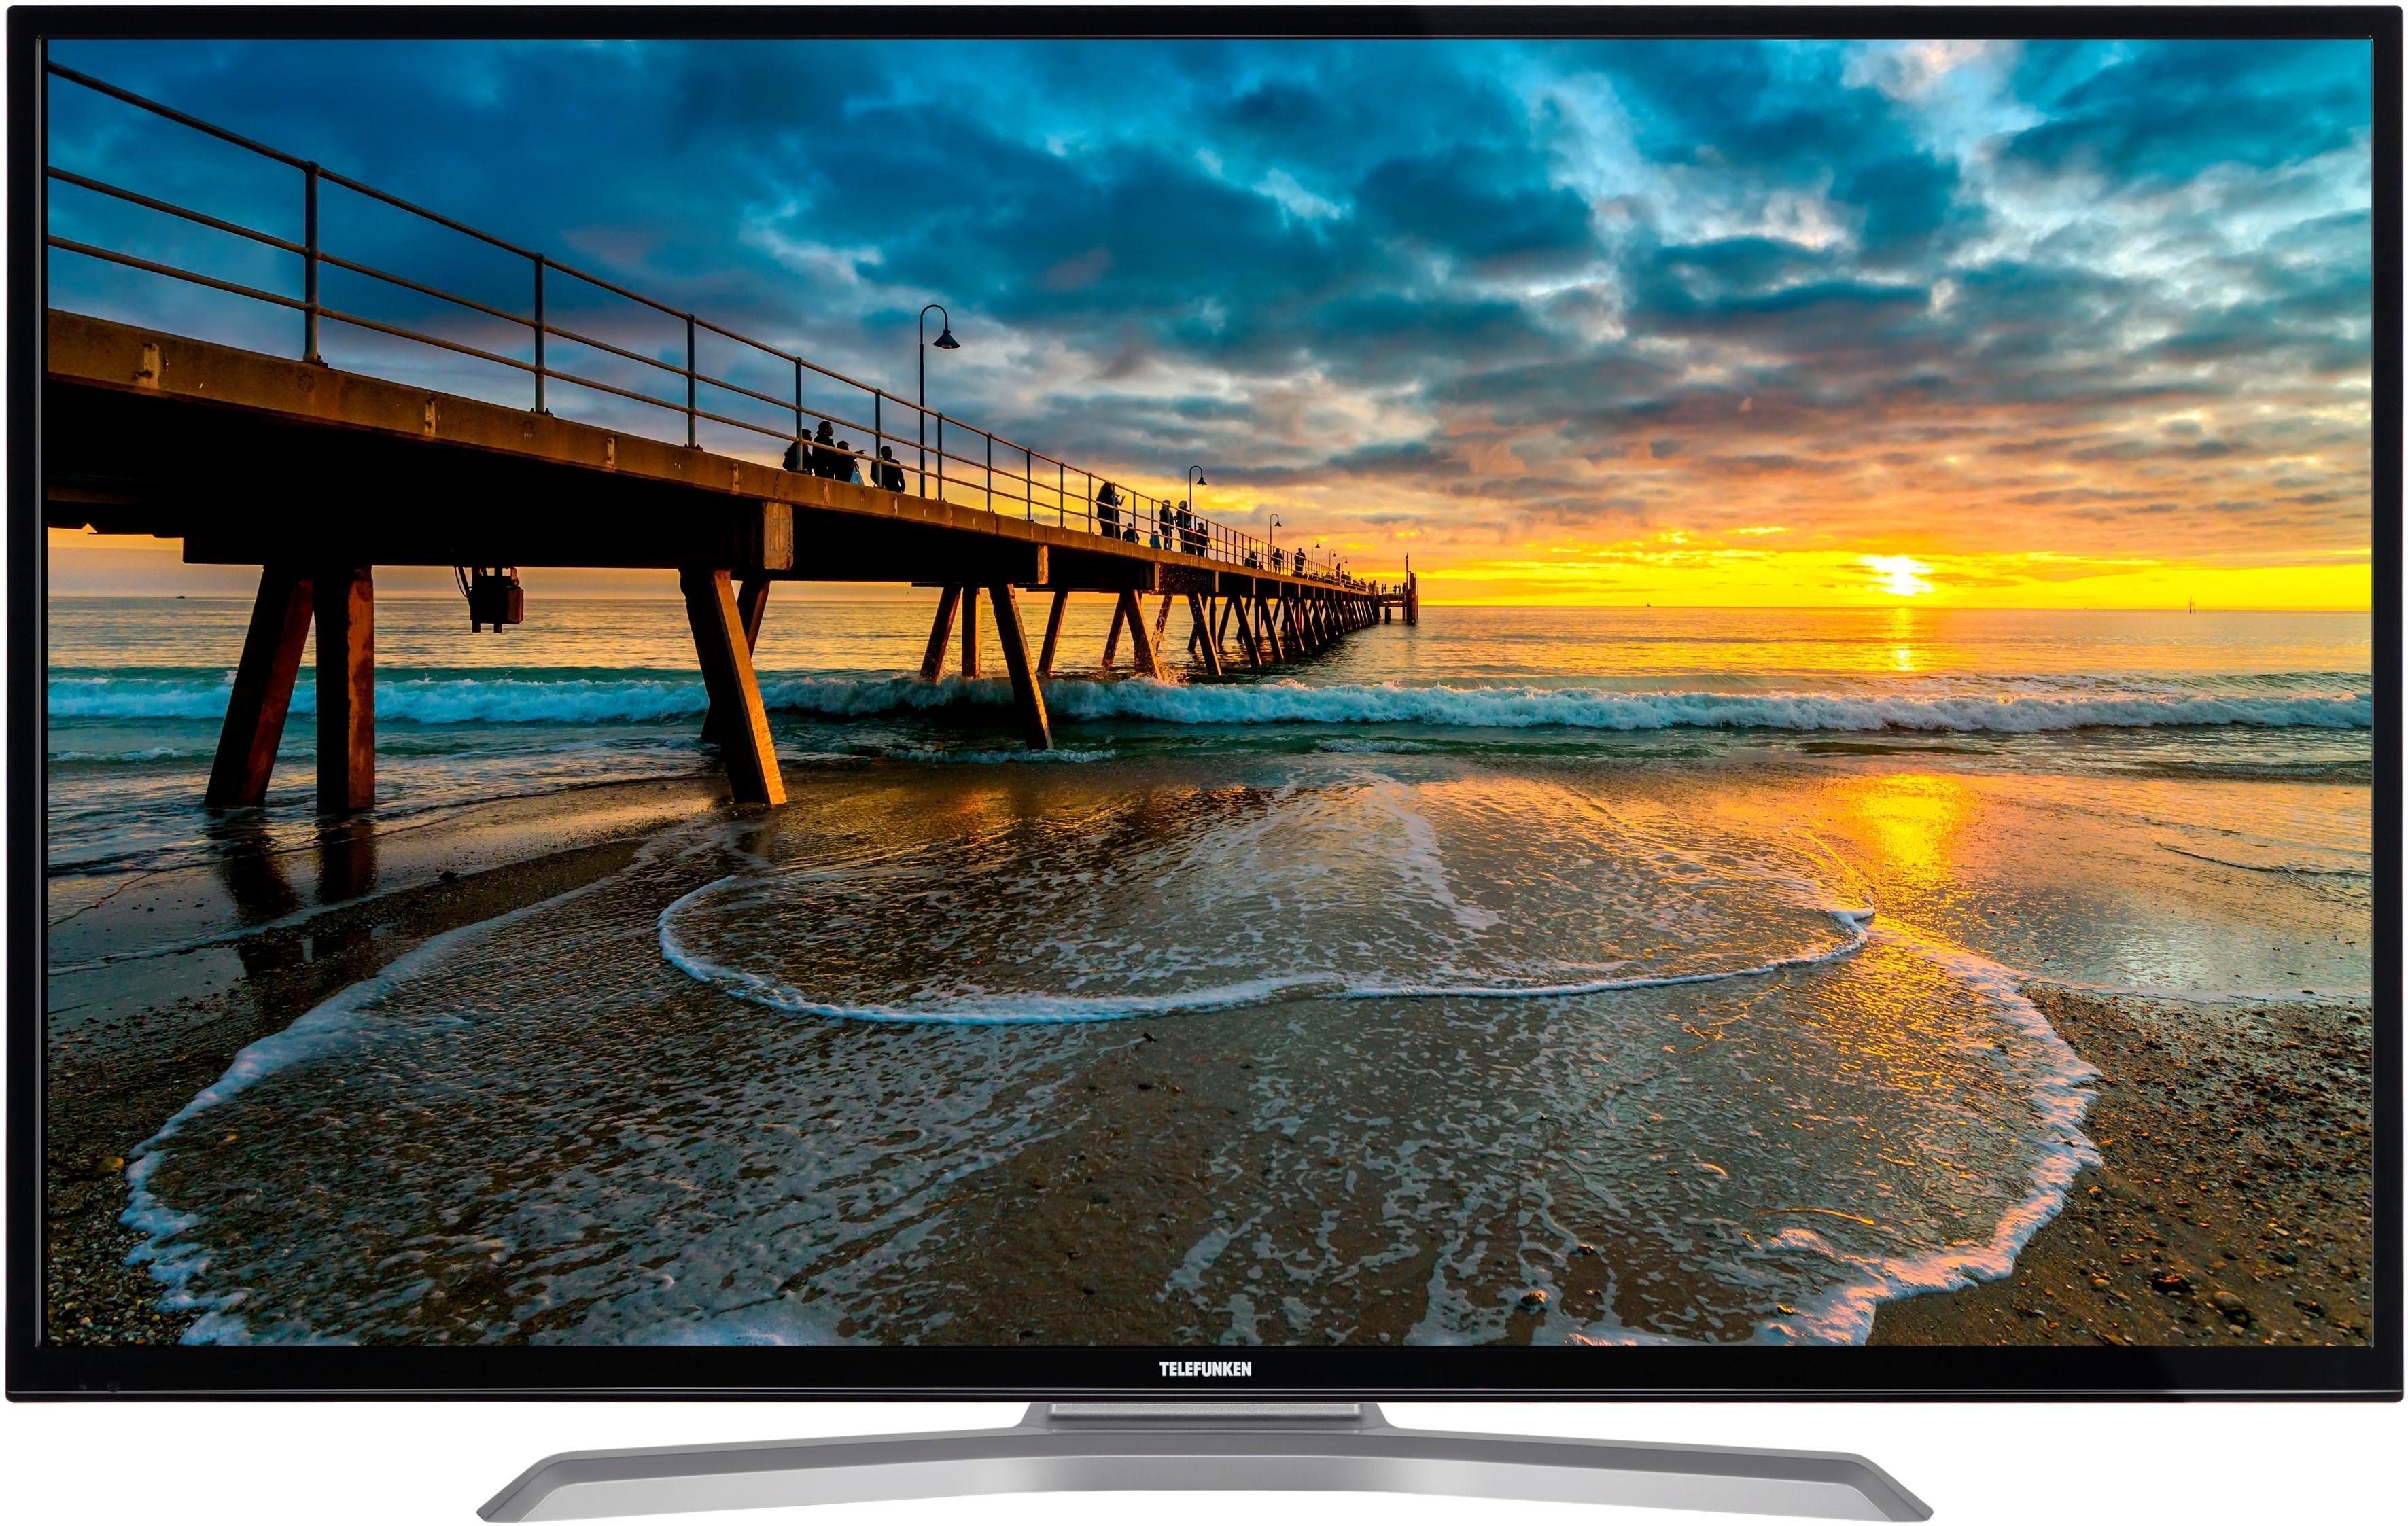 Telefunken D43U700M4CWH led-tv (43 inch), 4K Ultra HD, smart-tv veilig op otto.nl kopen